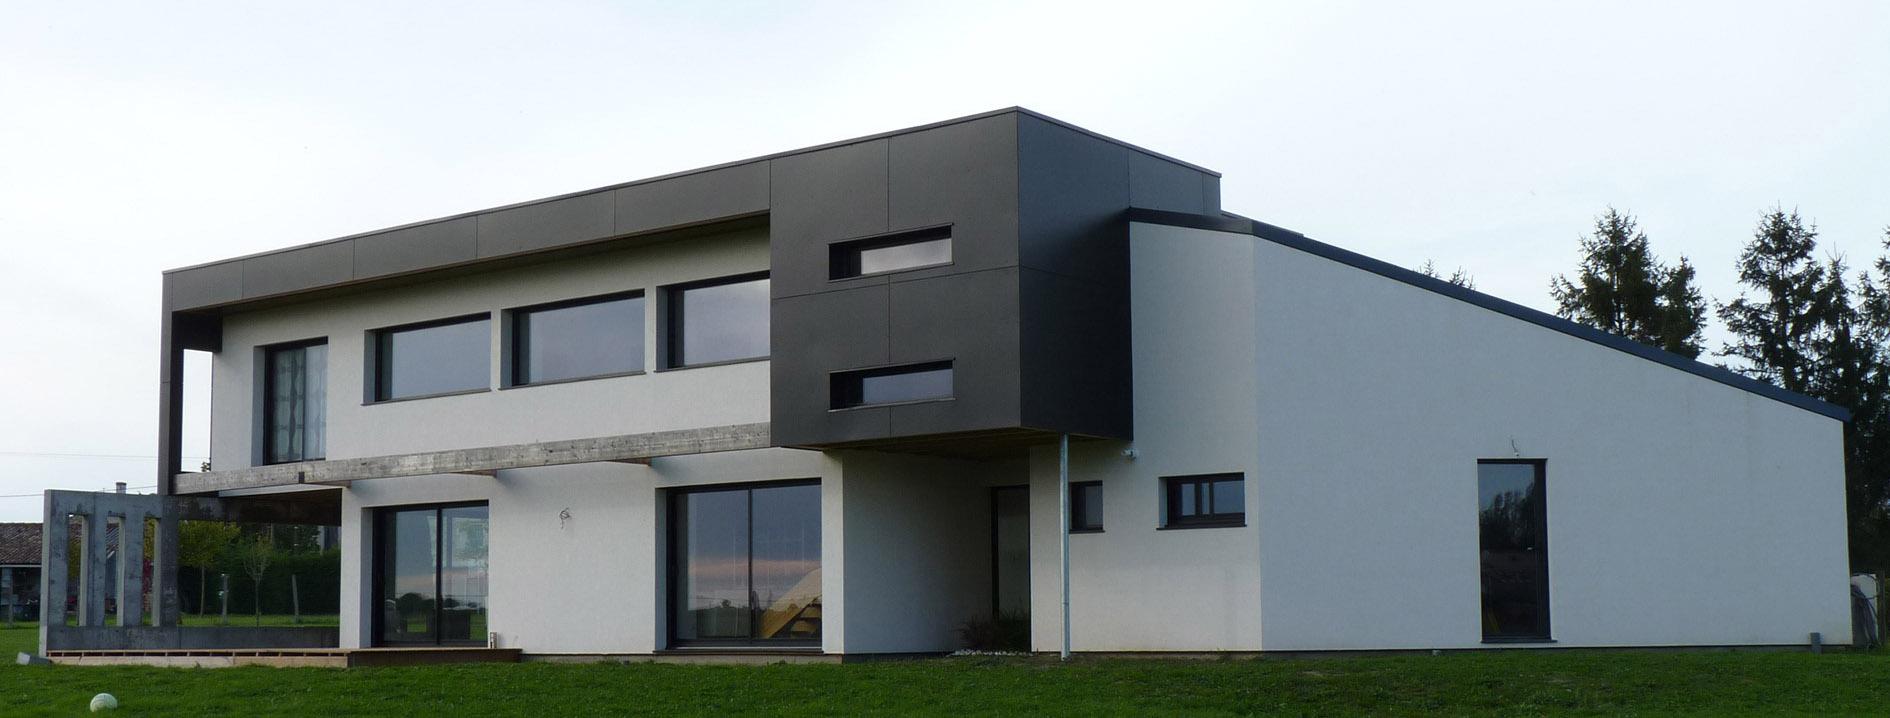 Daviet architecte